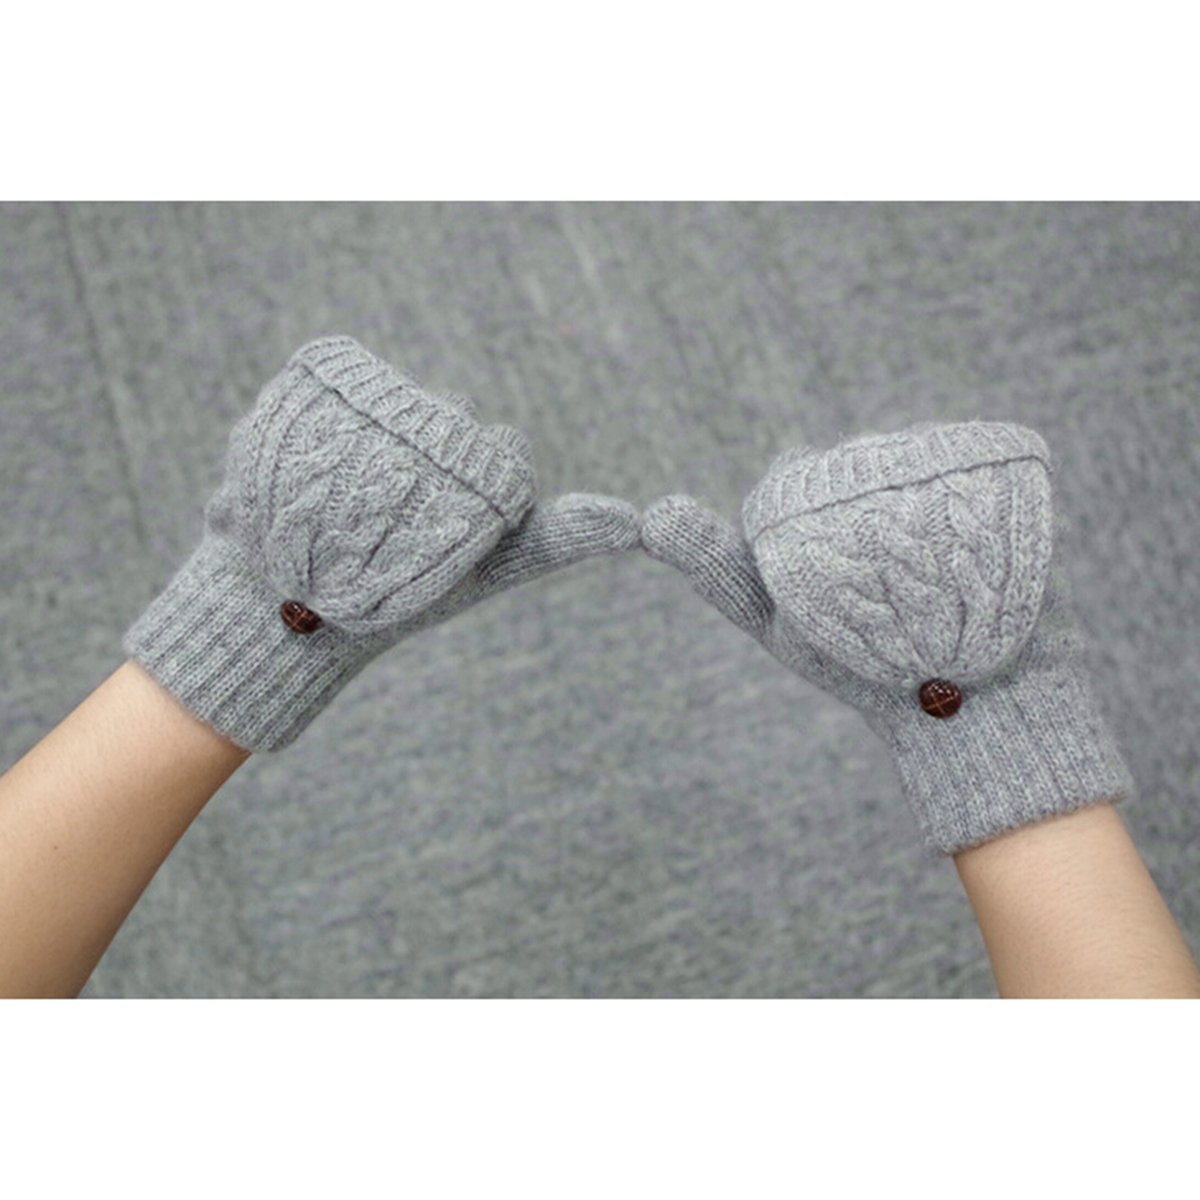 OULII Guante guantes guantes sin dedos lana guantes punto cálido invierno lana punto Convertible Fingerless de los guantes con manopla tapa (gris) - regalo de Navidad para chicas mujeres